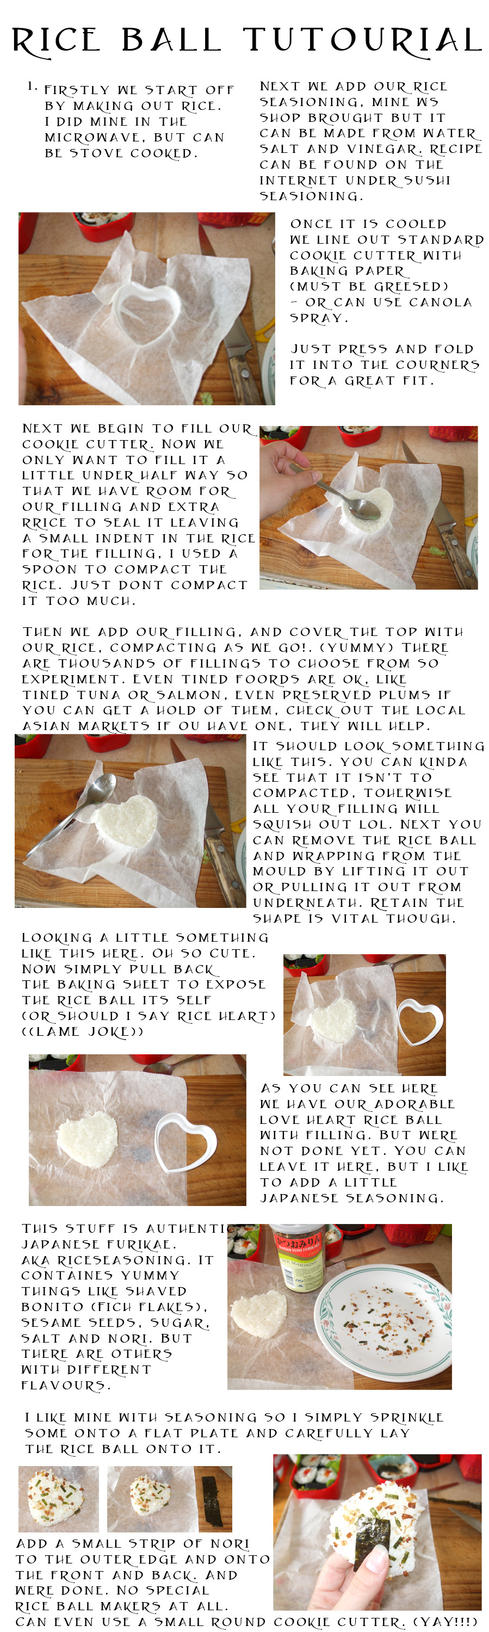 Cookie-cutter rice ball tutour by TheGreyPhoenix